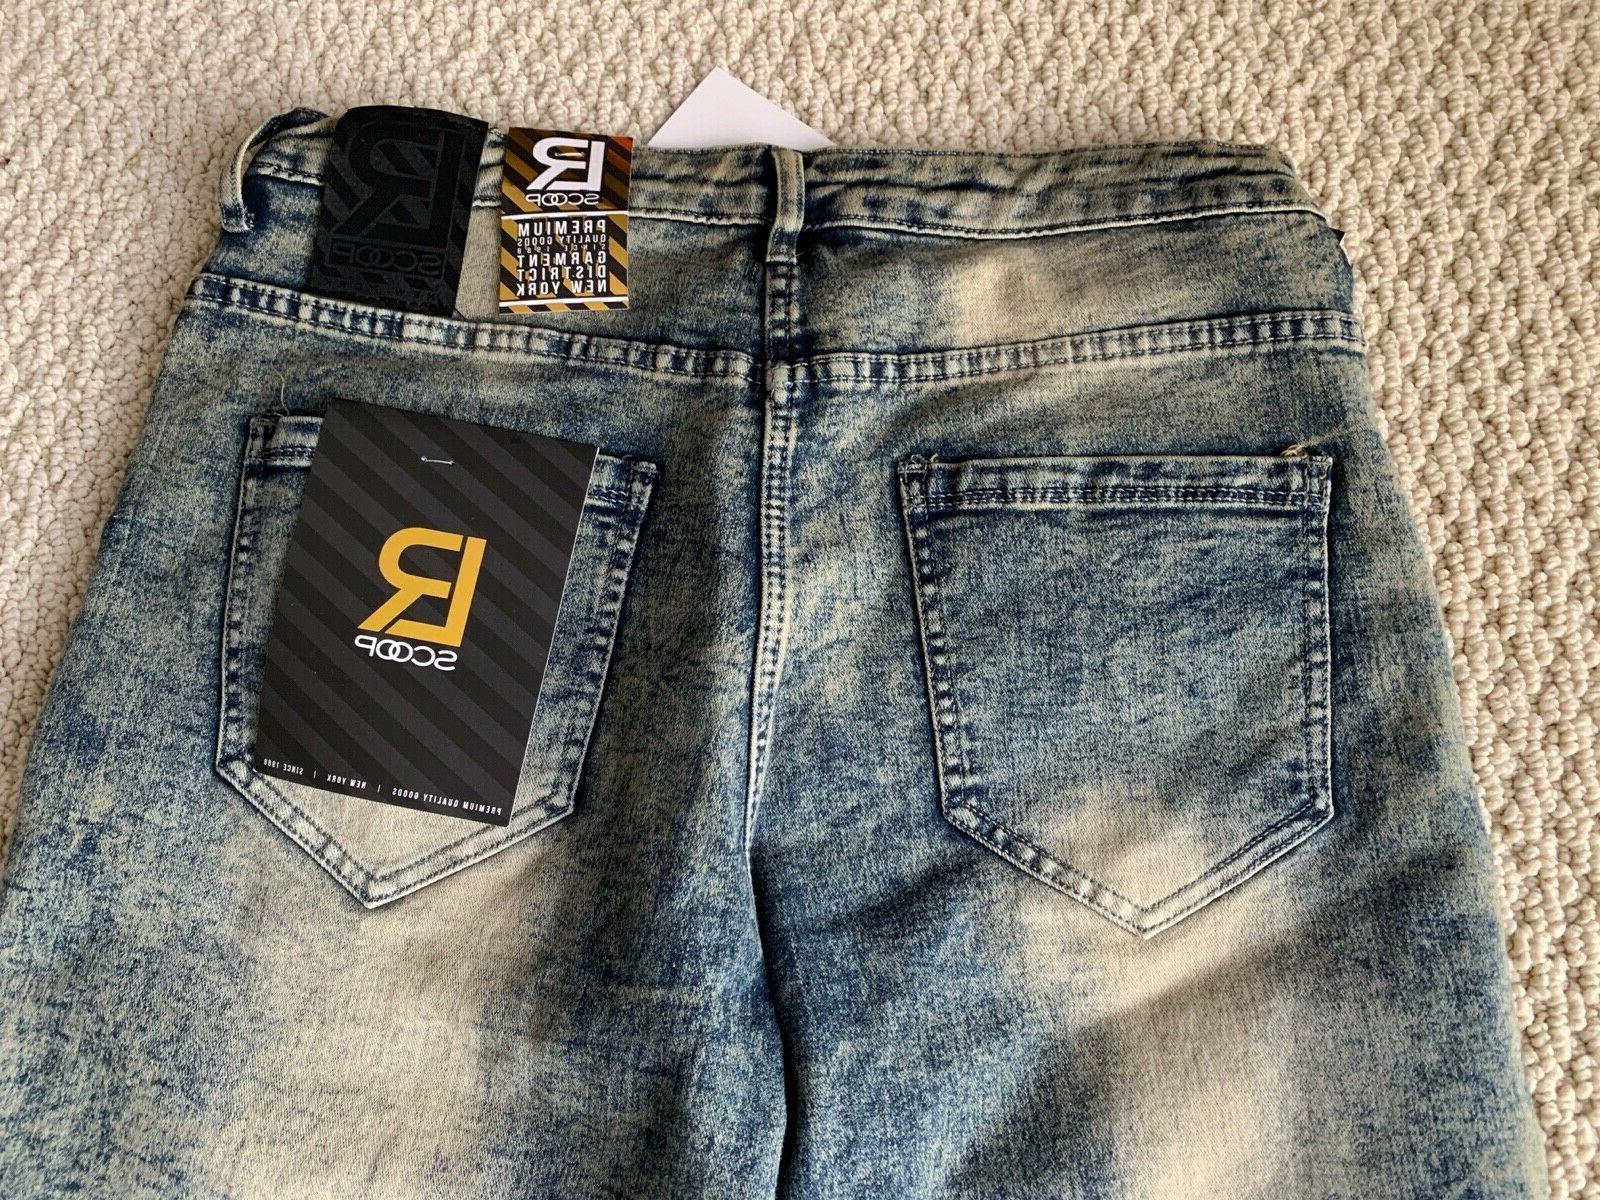 NWT Men's LR Scoop MHS80 Acid Jean Shorts 32-36